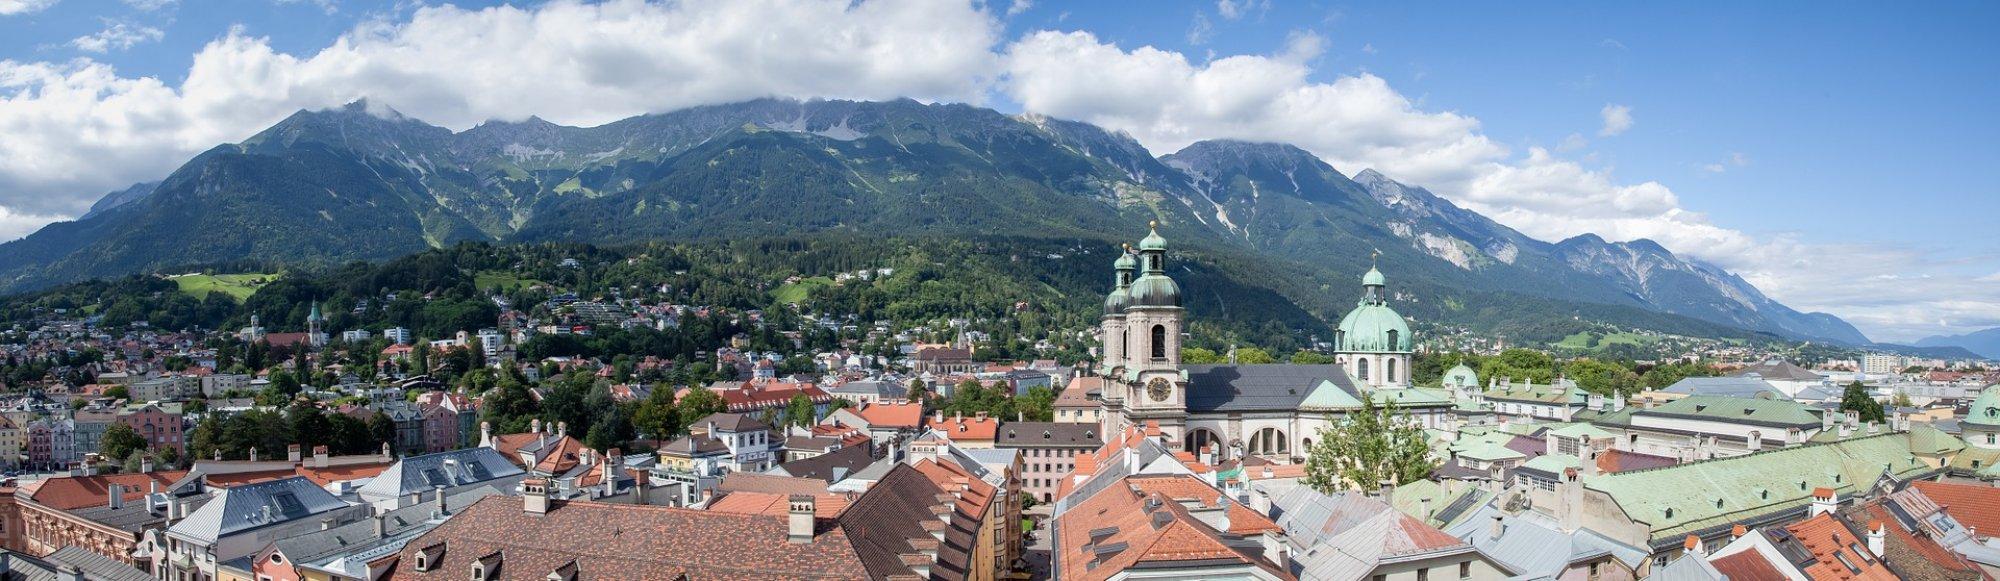 Wedding Venues Austria Innsbruck Tyrol